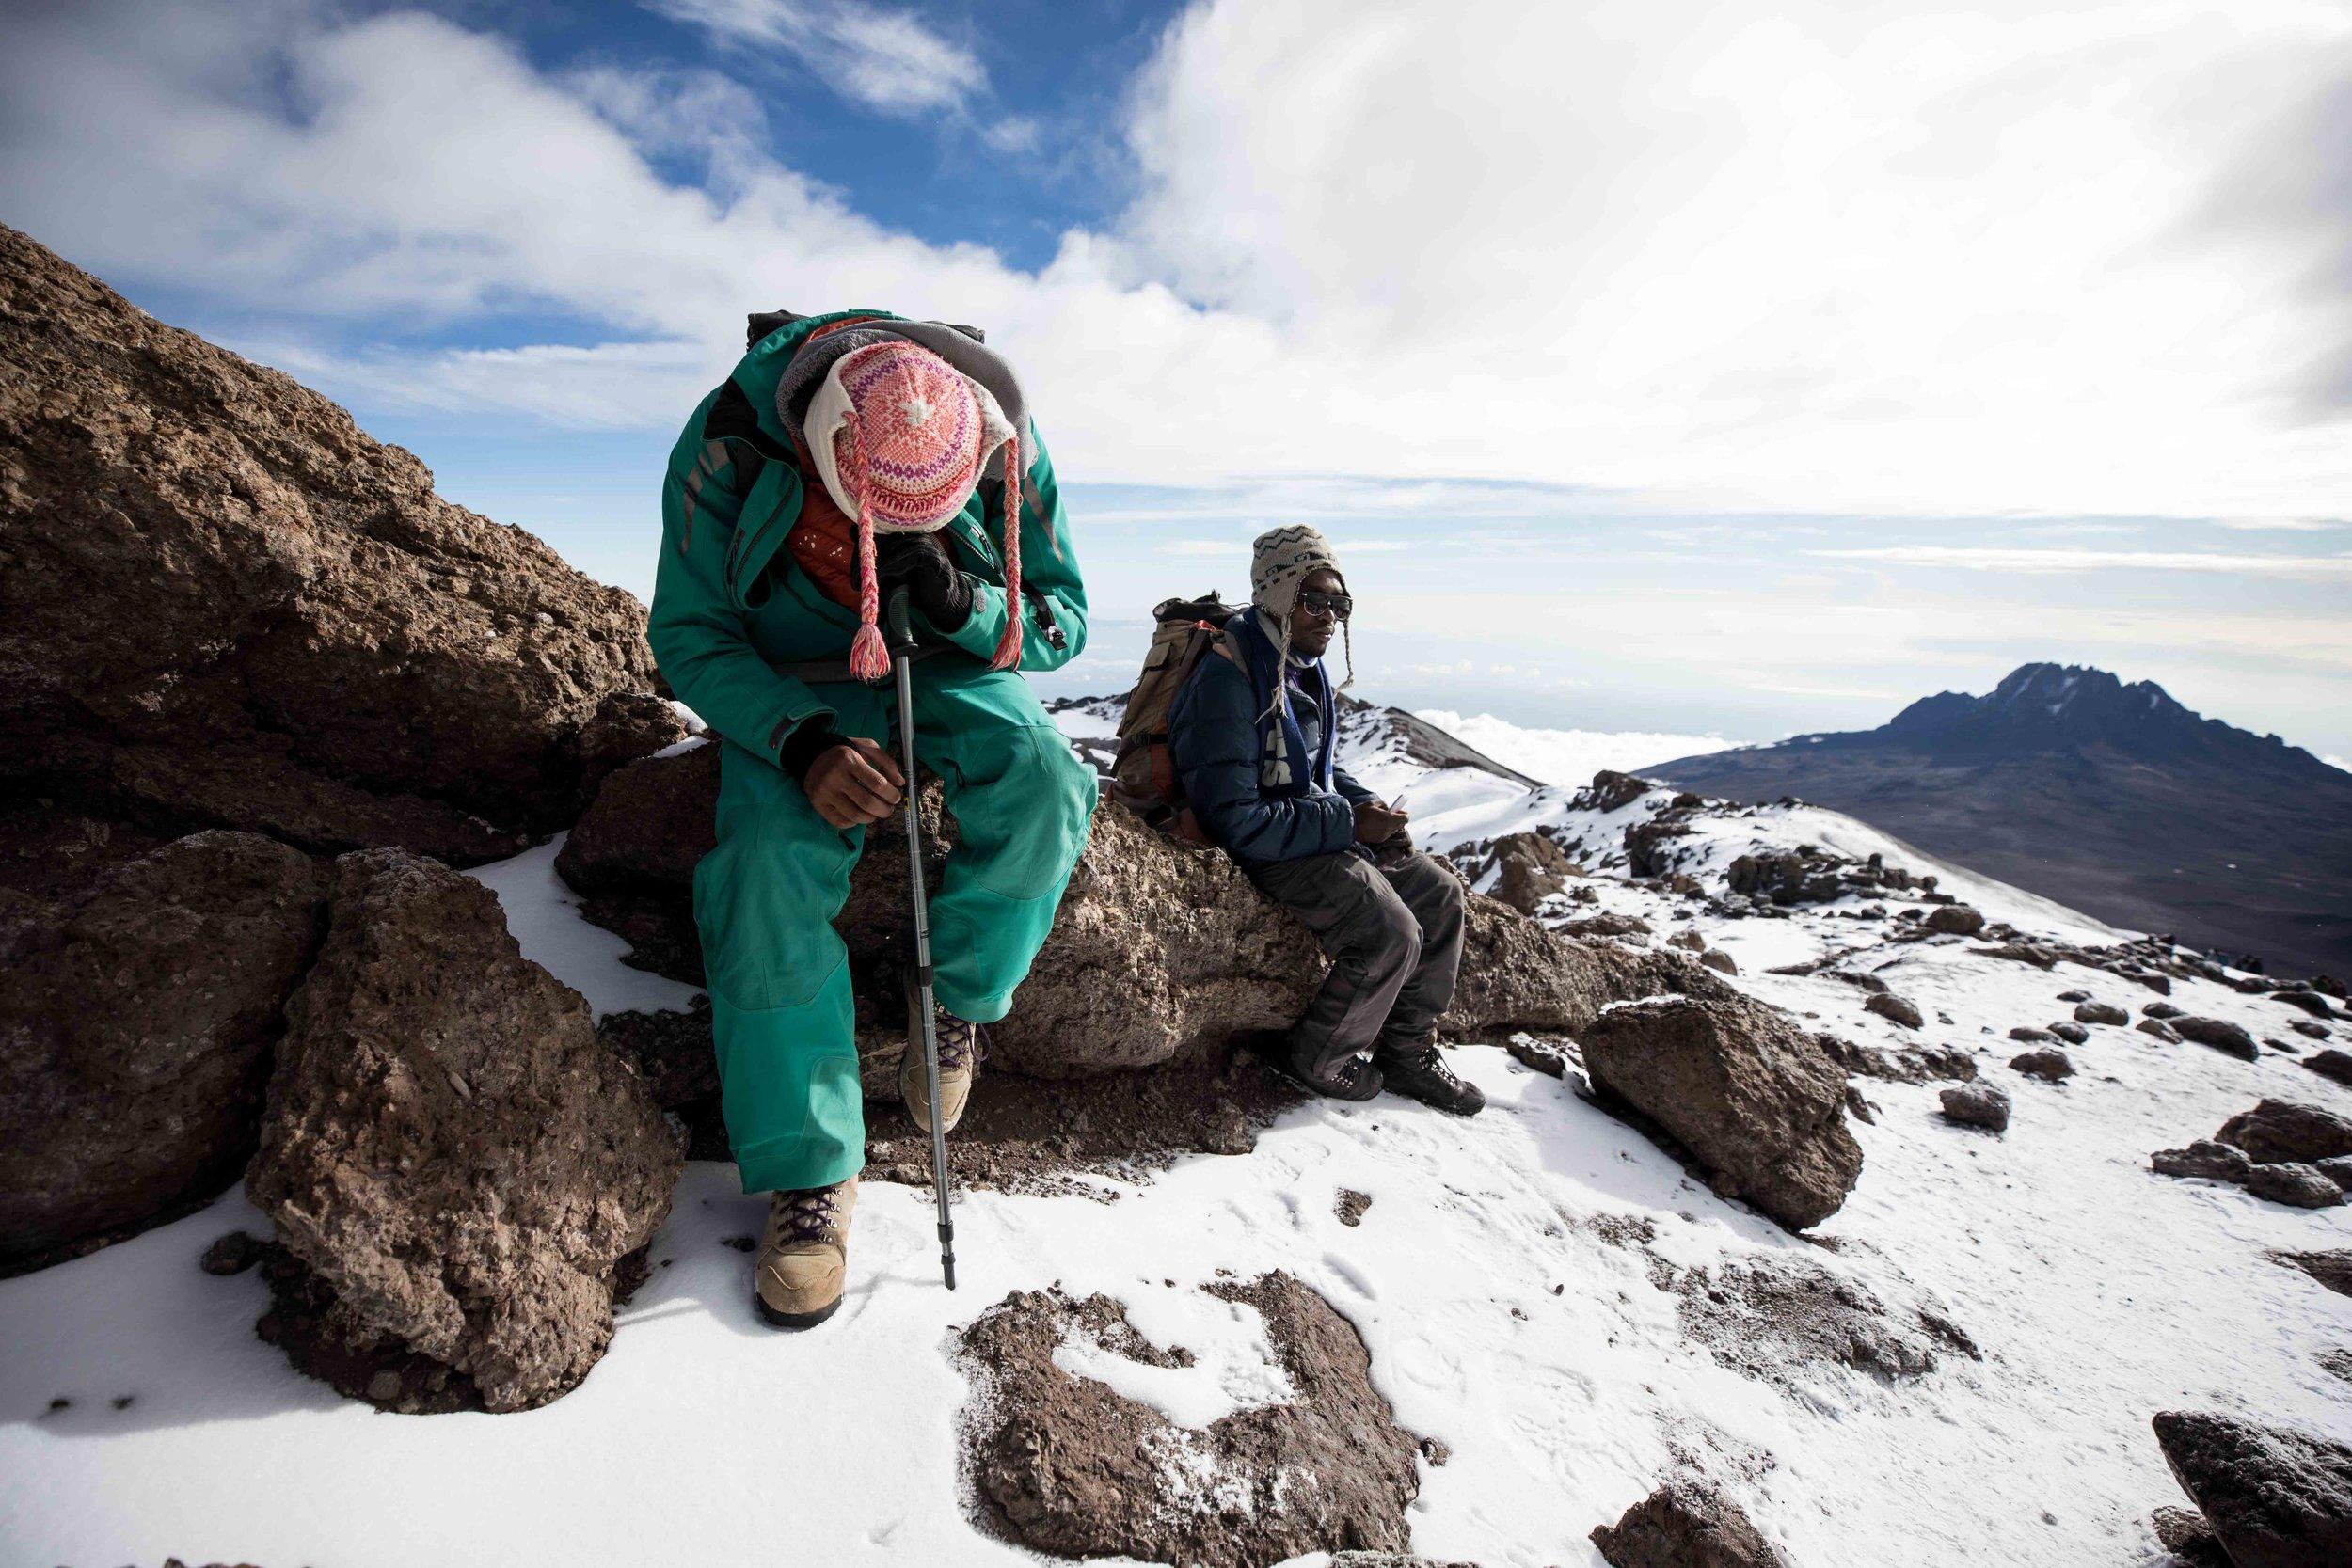 ajw_REI_Kilimanjaro-50.jpg